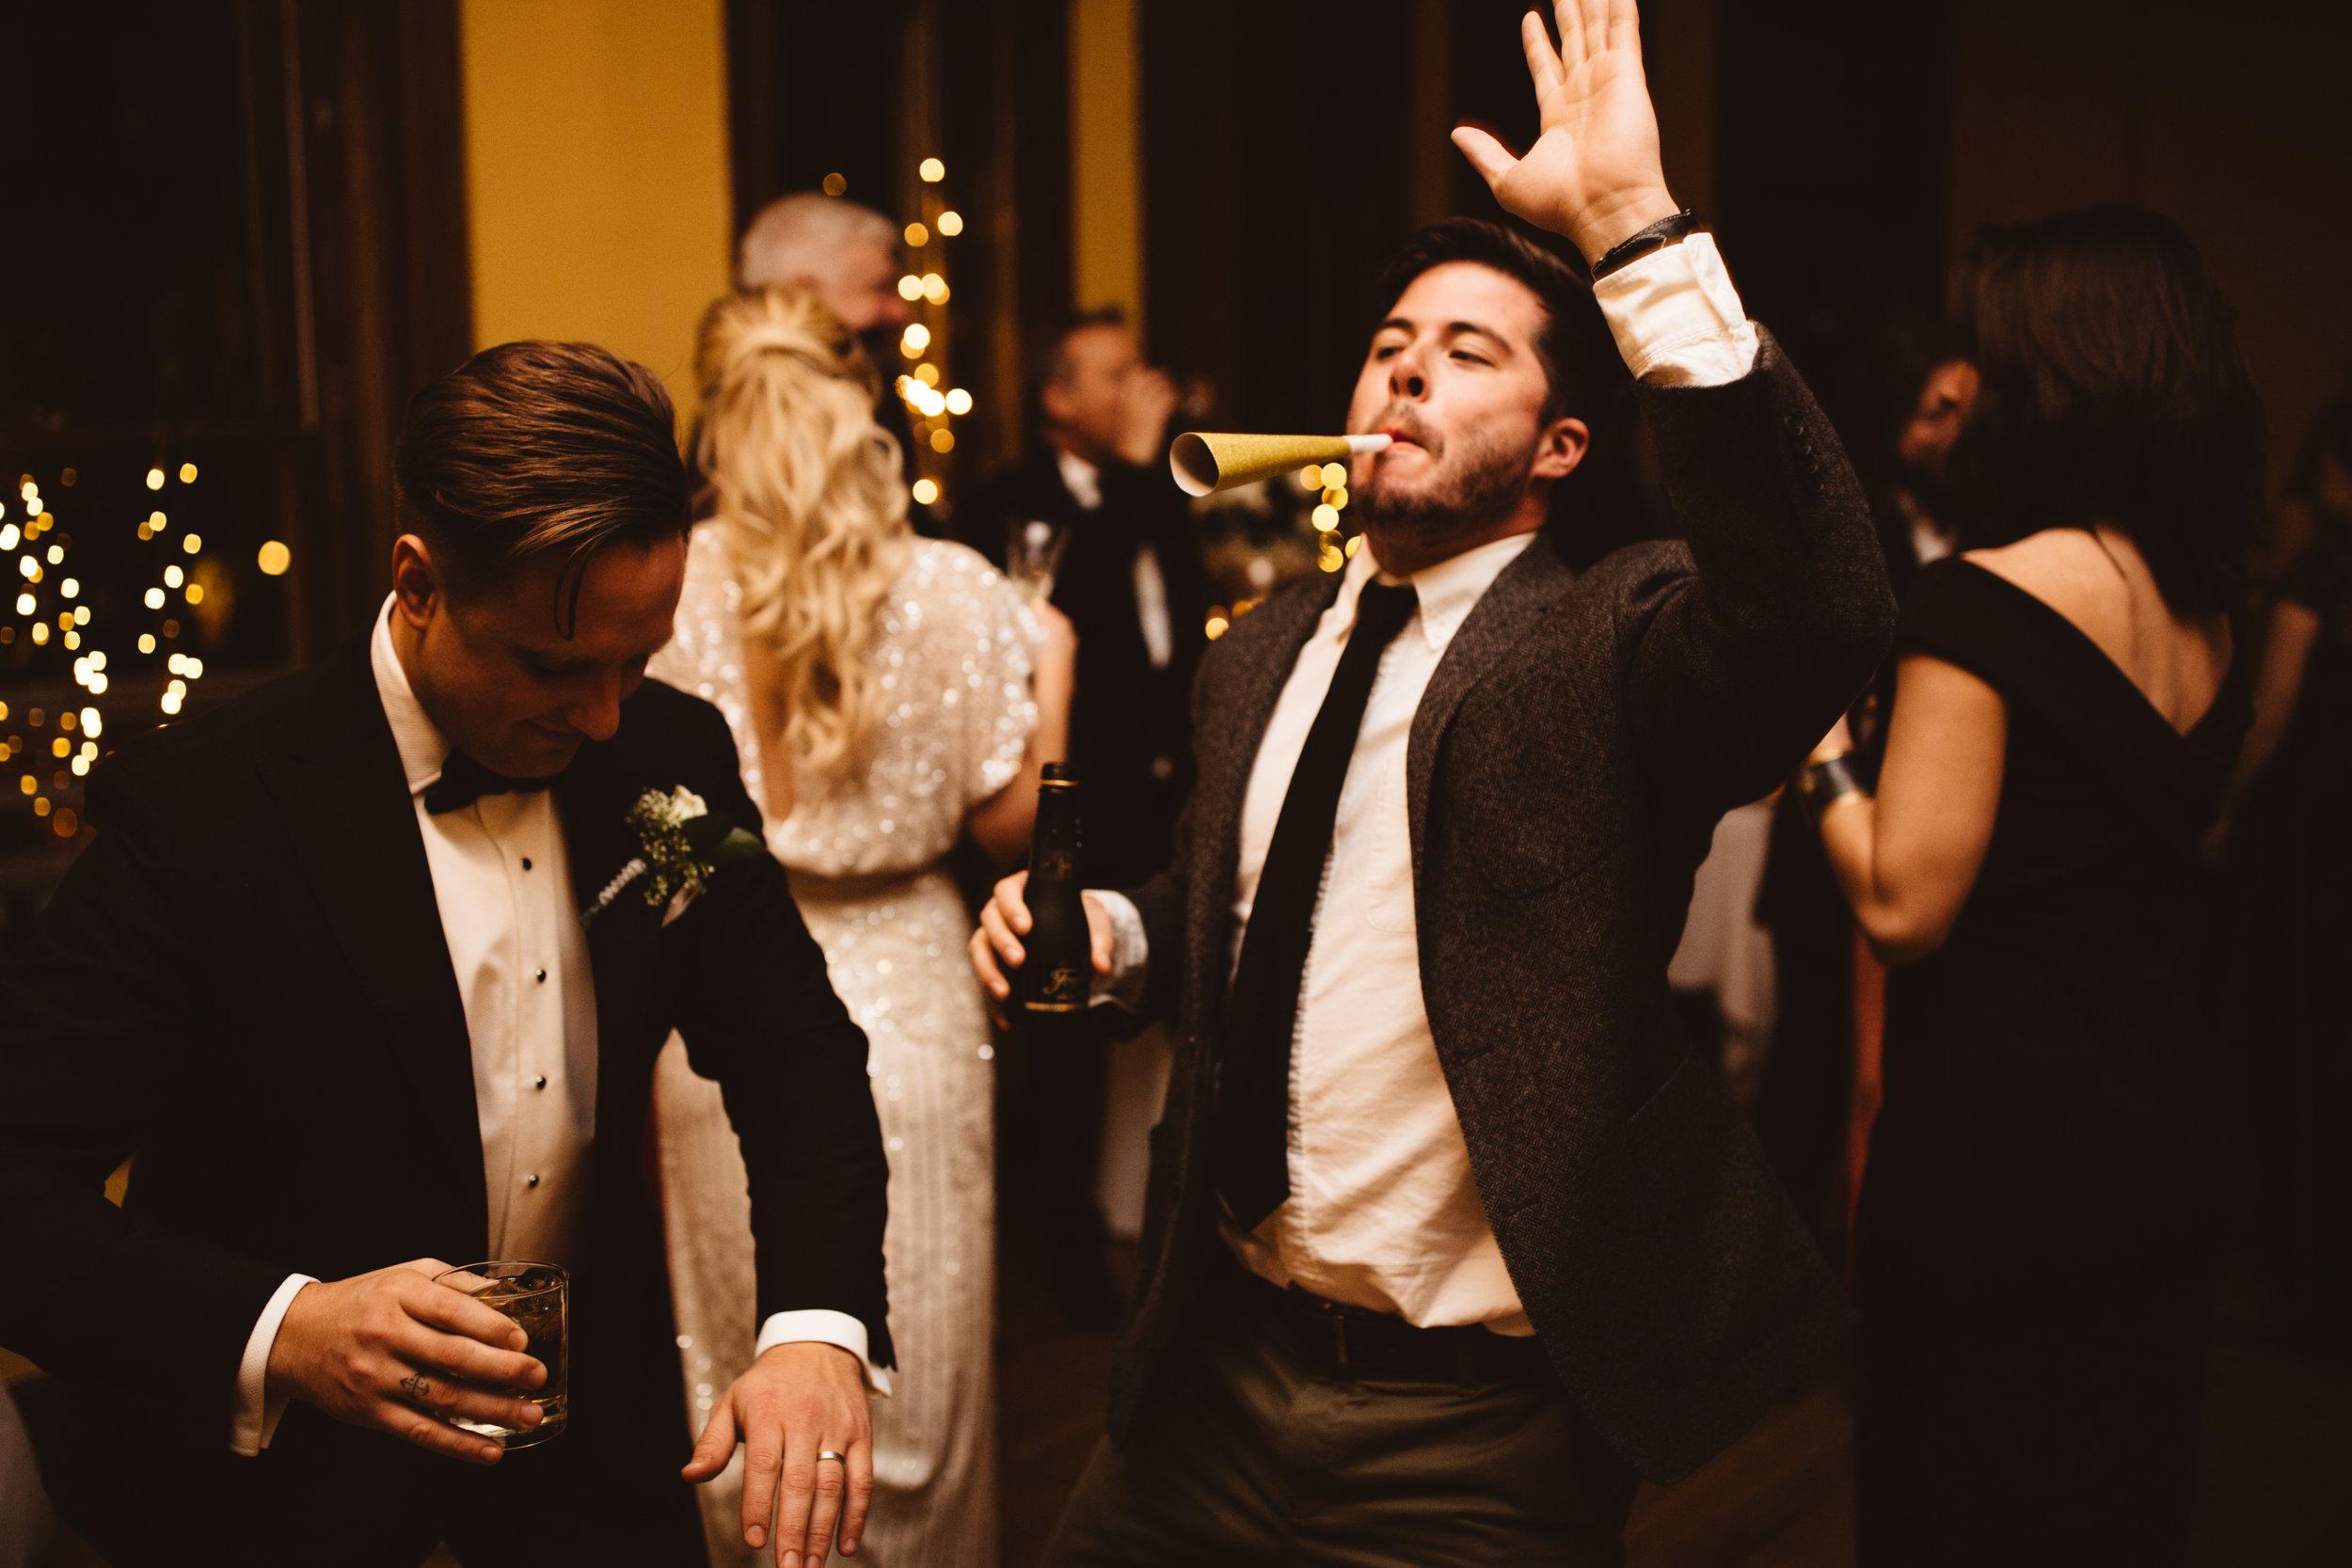 Mattie Bell Photography- Kelly & Zack Wedding Atlanta Brewery -430.jpg